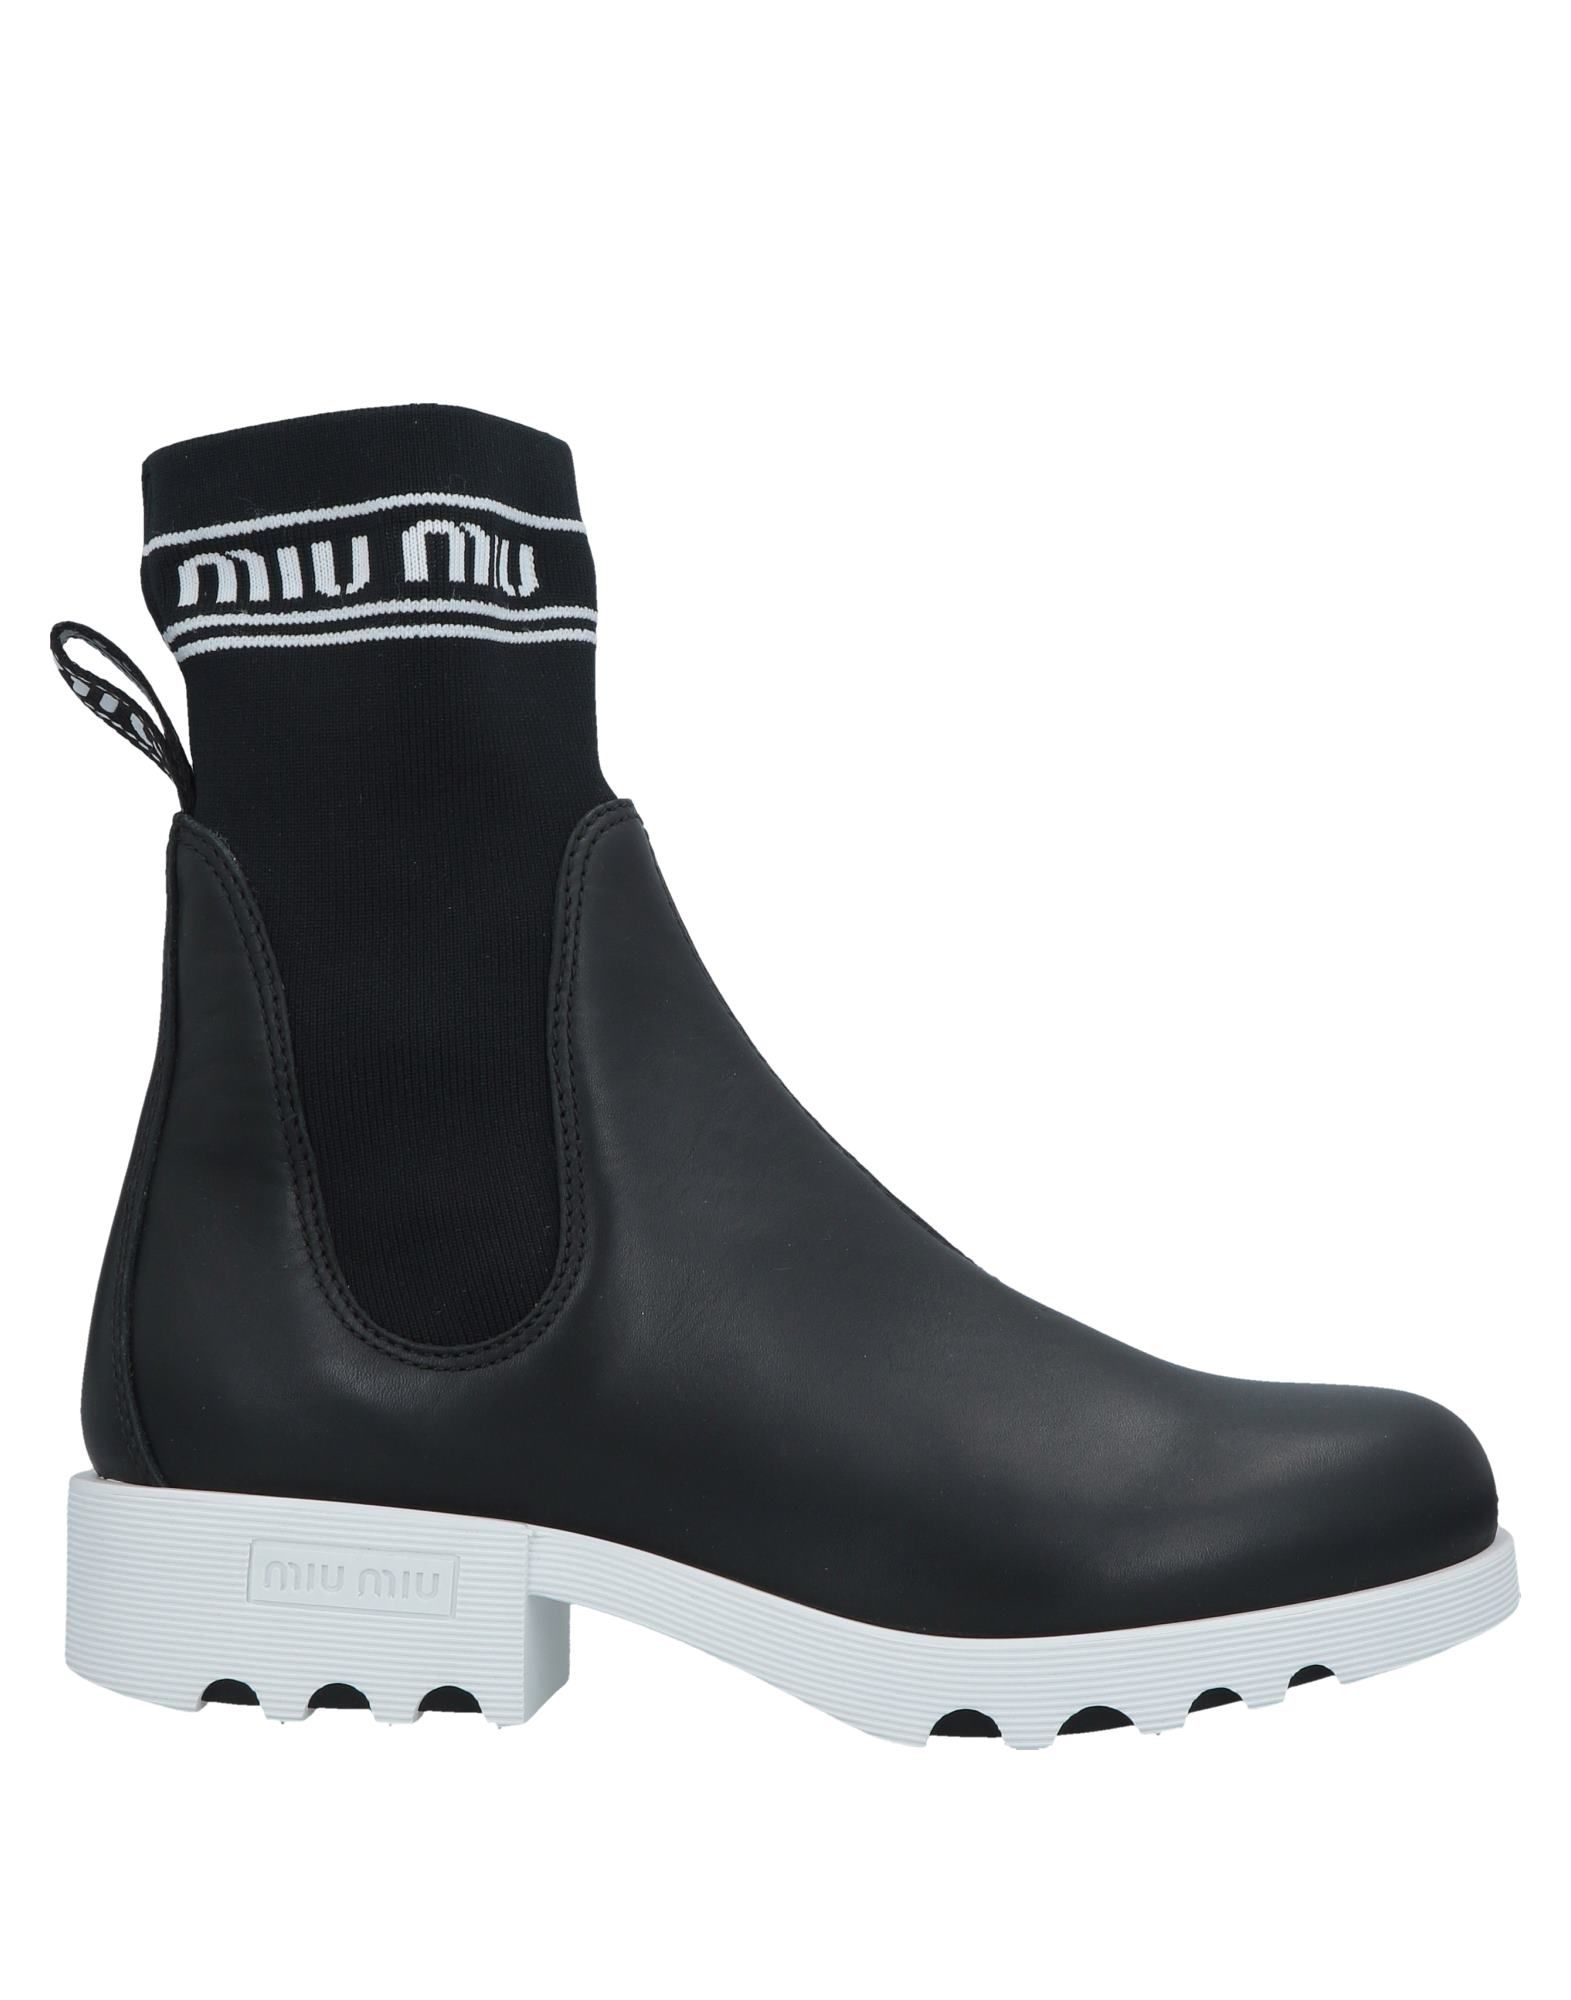 ab4ee57350ea0 Miu Miu Ankle Boot - Women Miu Miu Ankle Boots online on YOOX ...